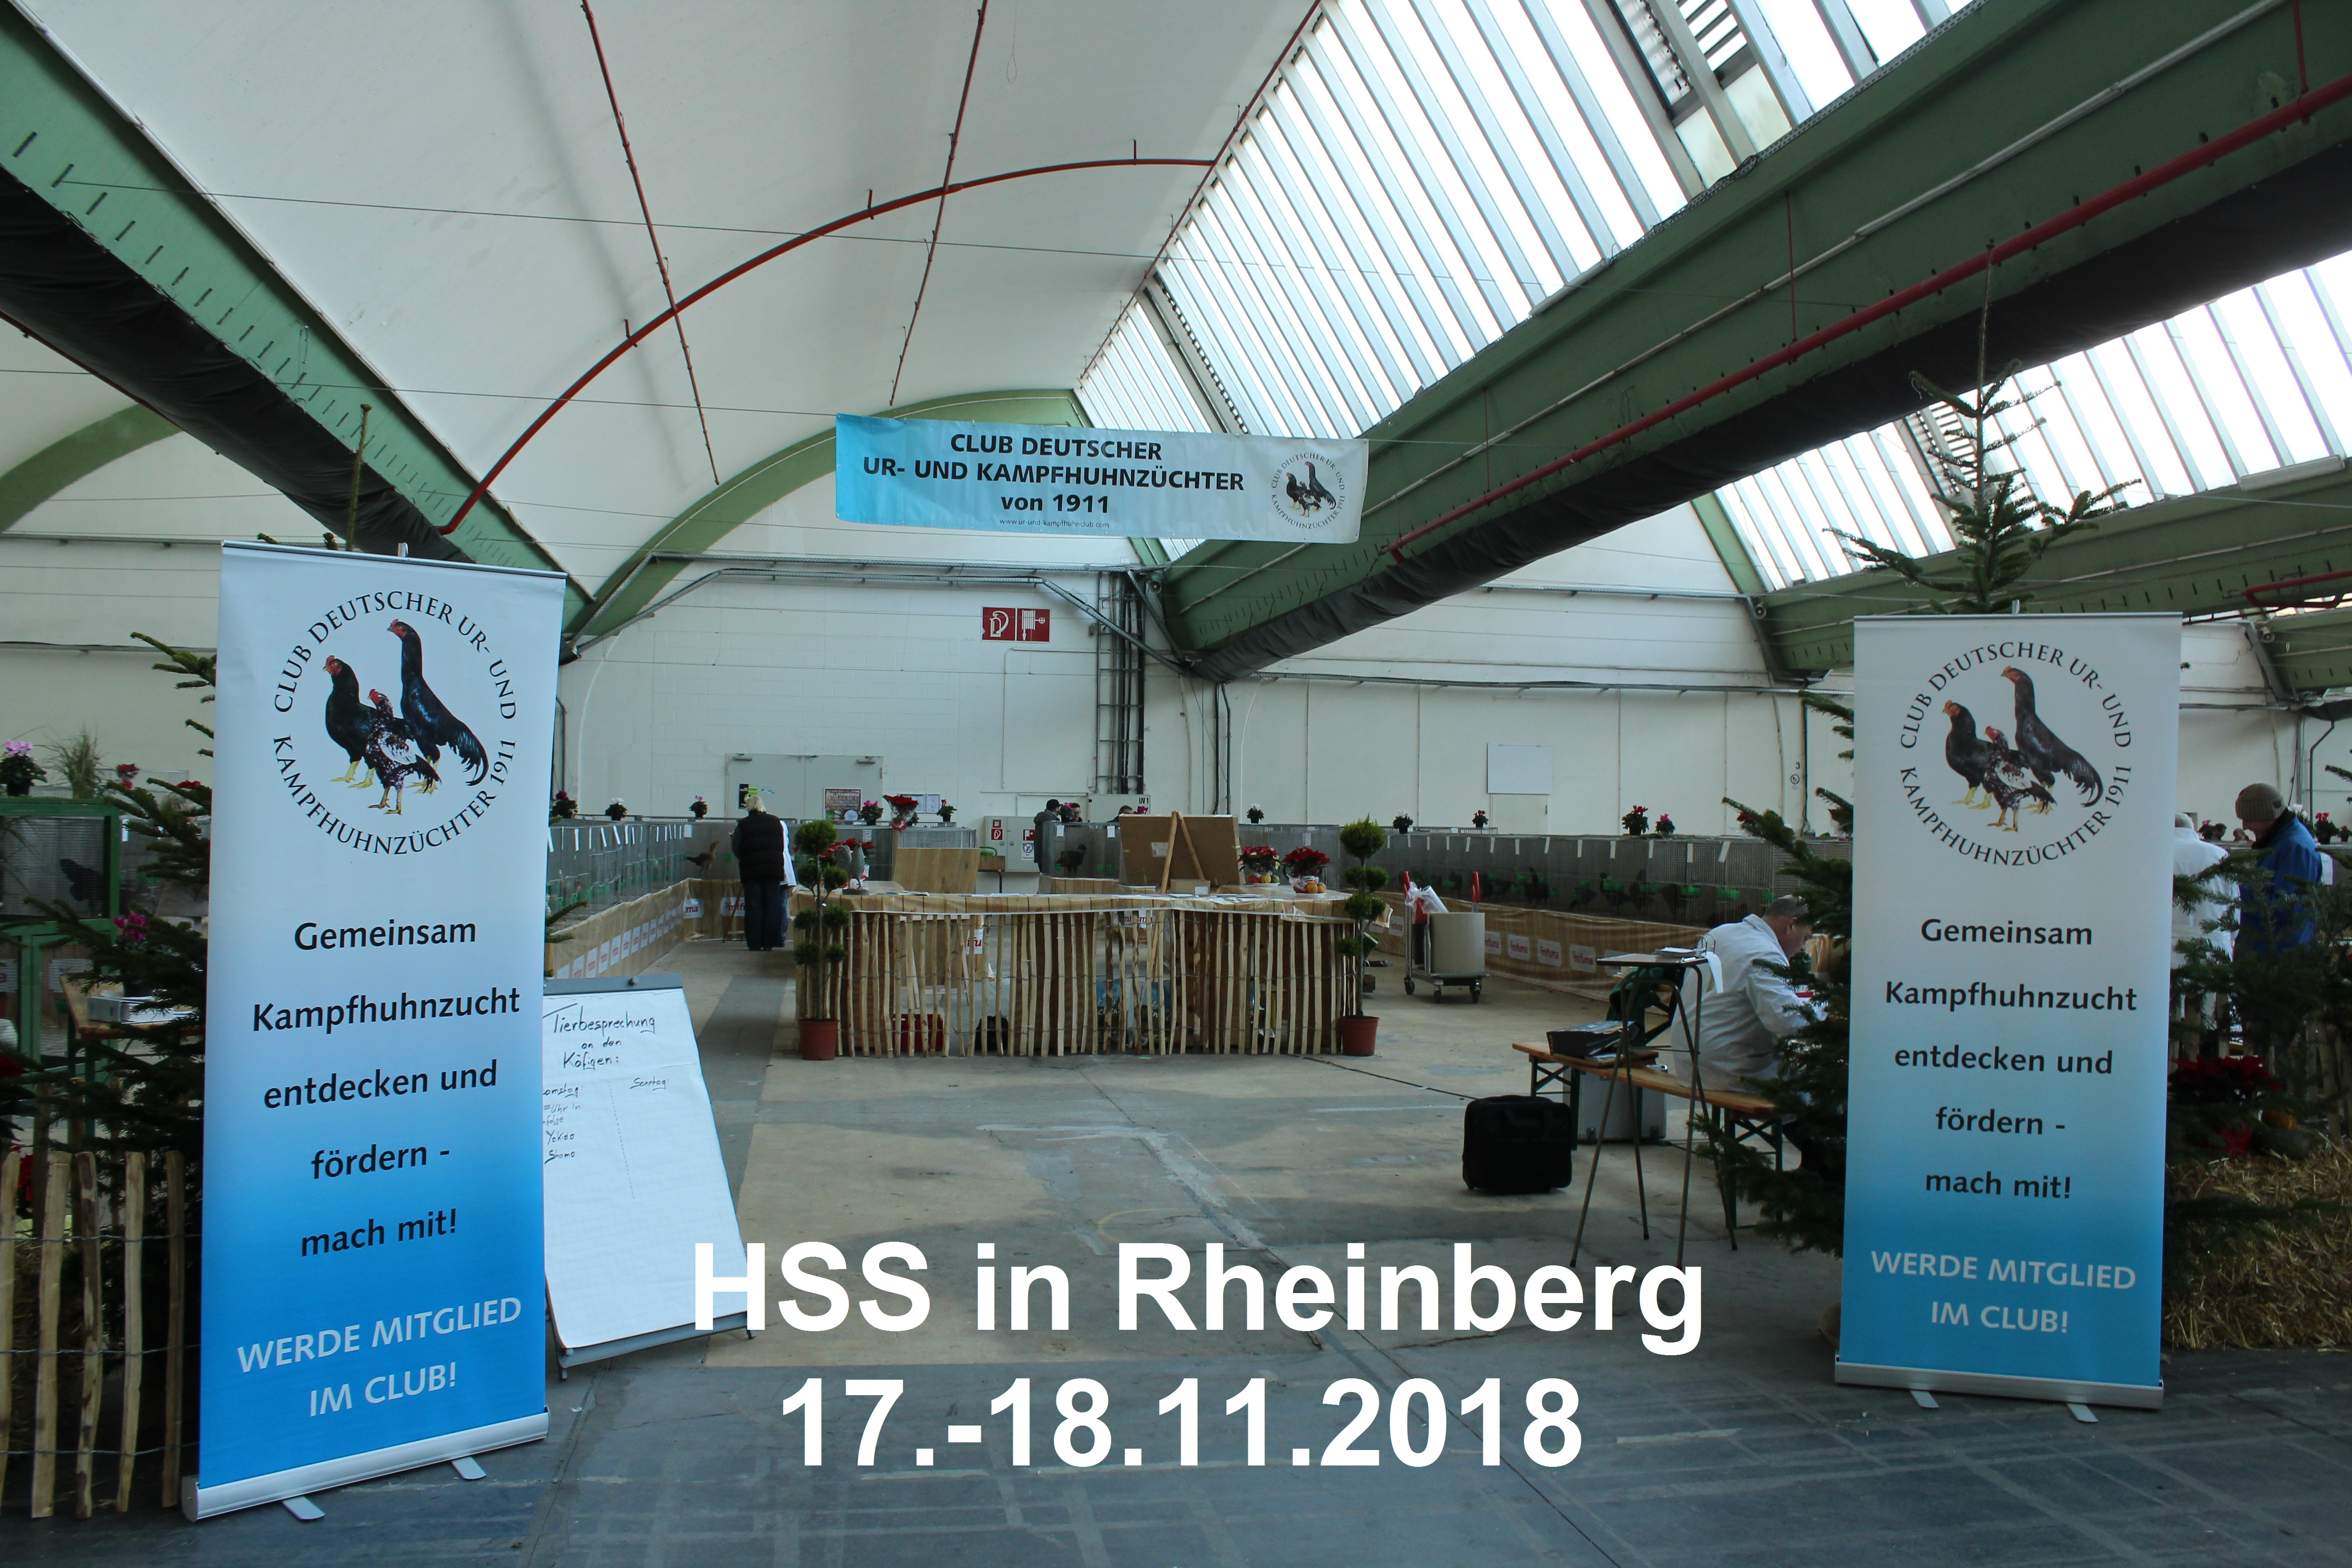 HSS in Rheinberg 17.-18.11.2018